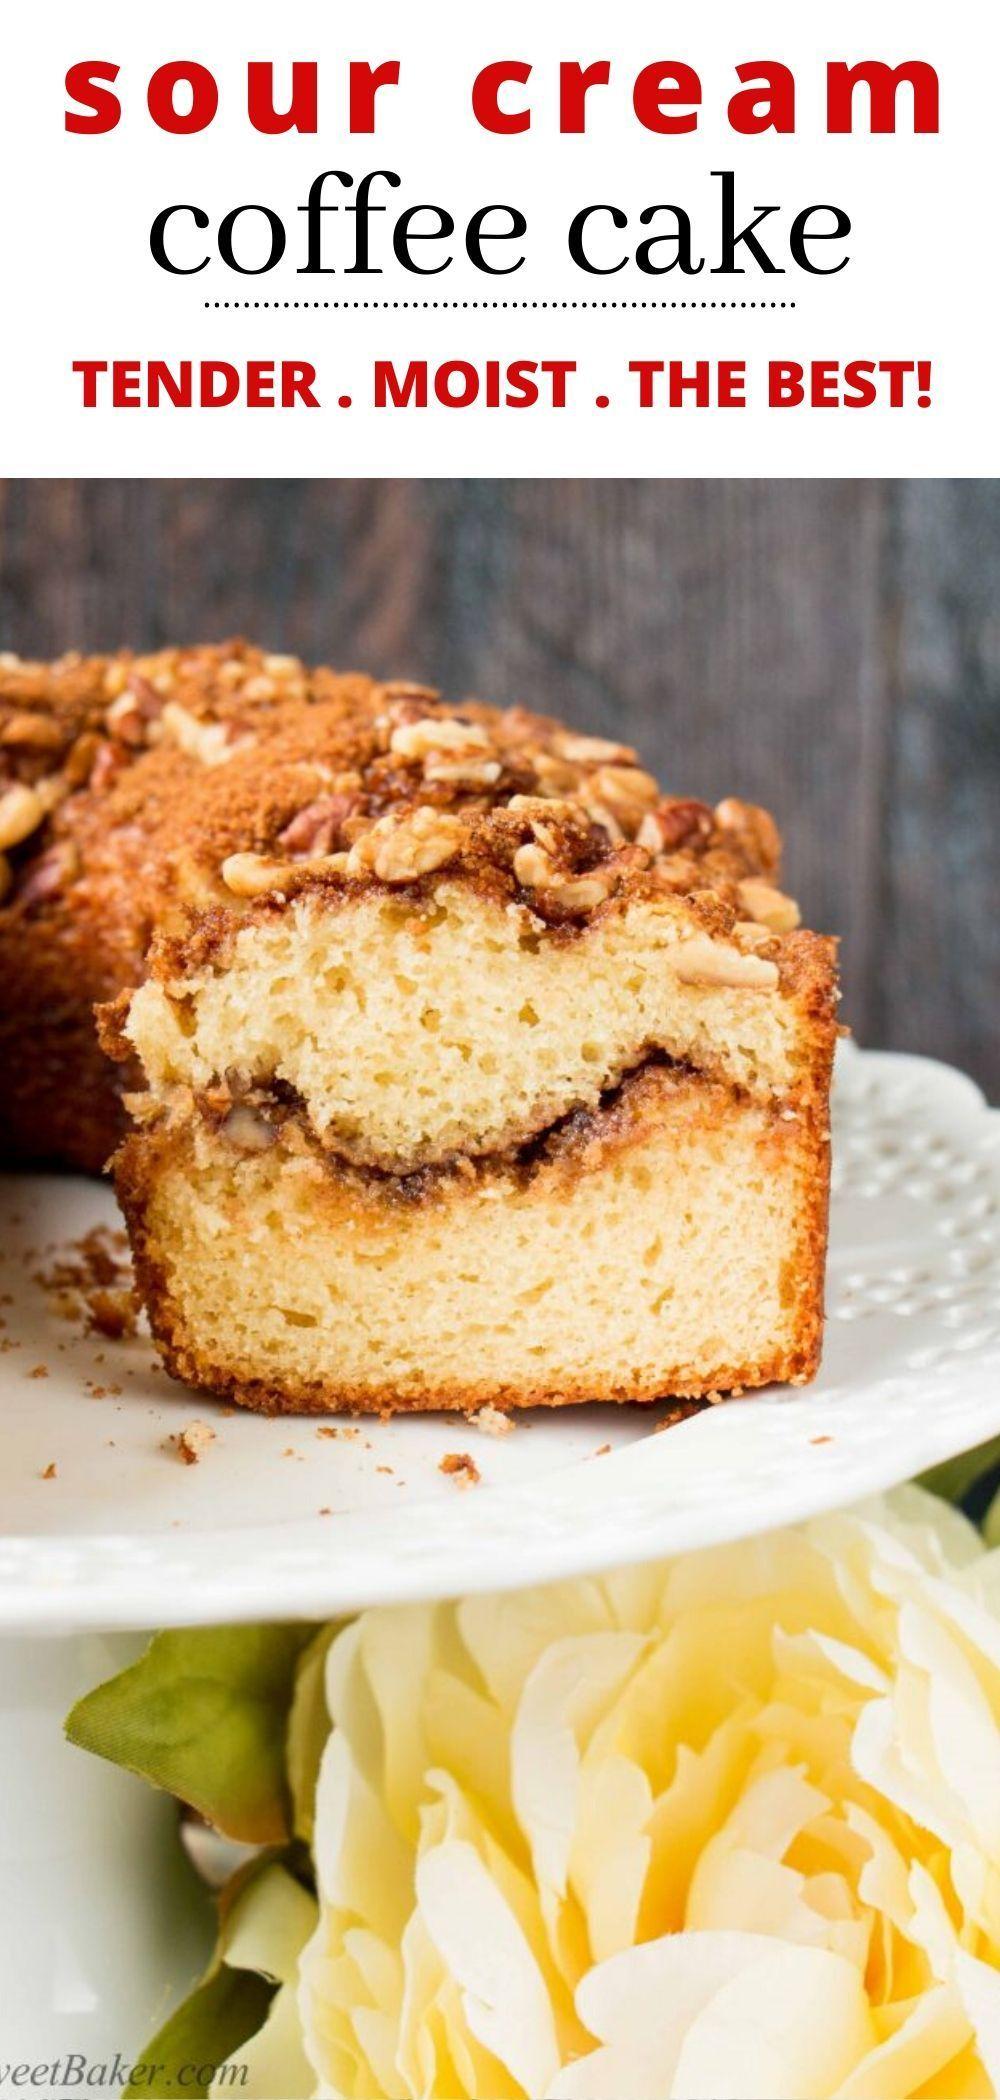 Sour Cream Coffee Cake Recipe In 2020 Coffee Cake Coffee Cake Recipes Coffee Cake Recipes Easy